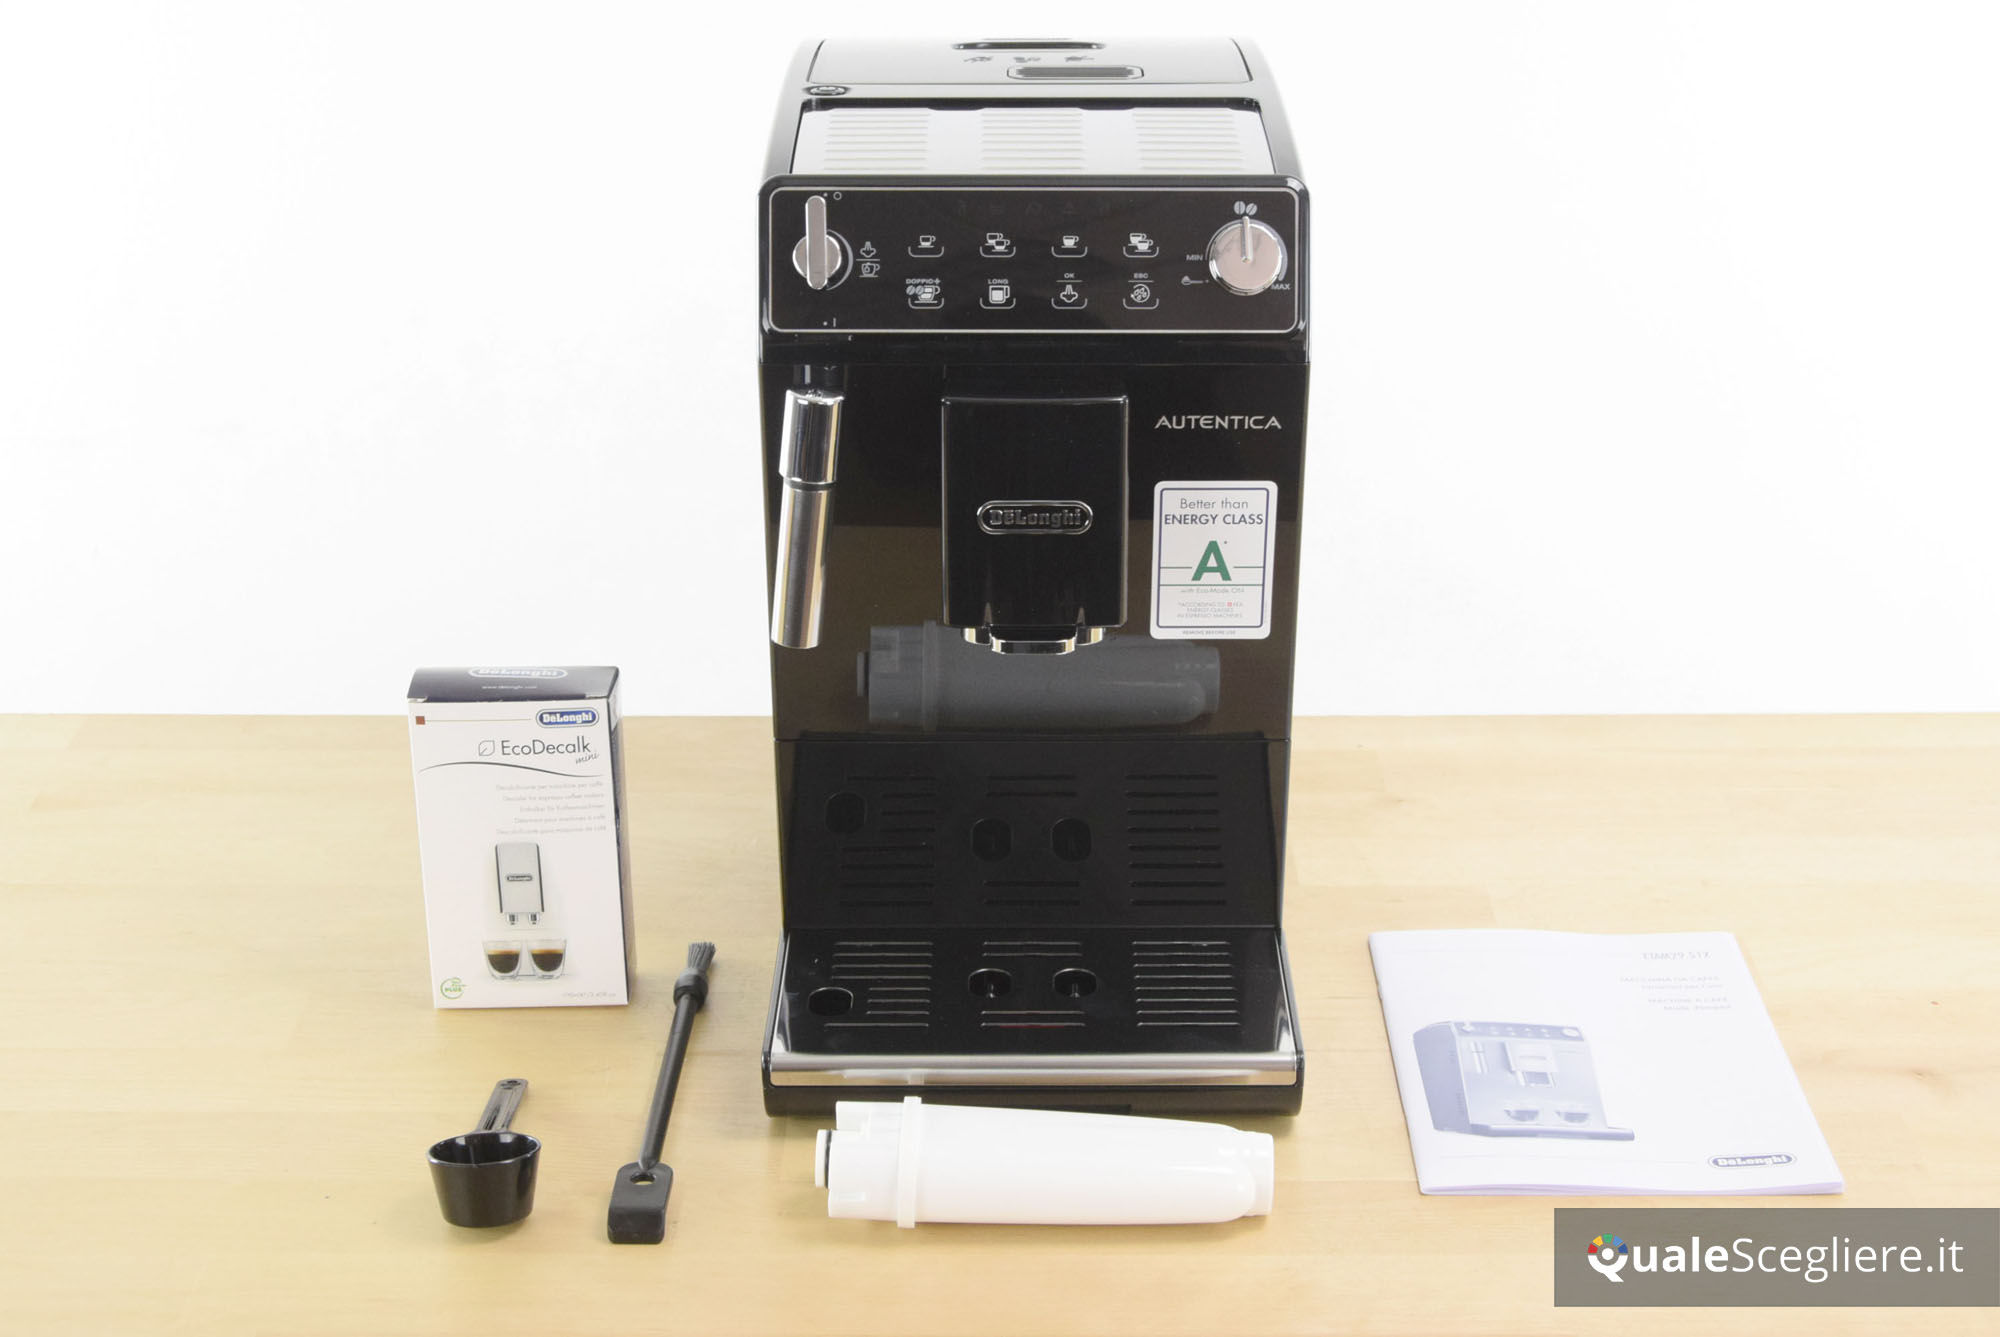 https://www.qualescegliere.it/wp-content/uploads/2016/02/macchina-da-caffe-automatica-accessori.jpeg